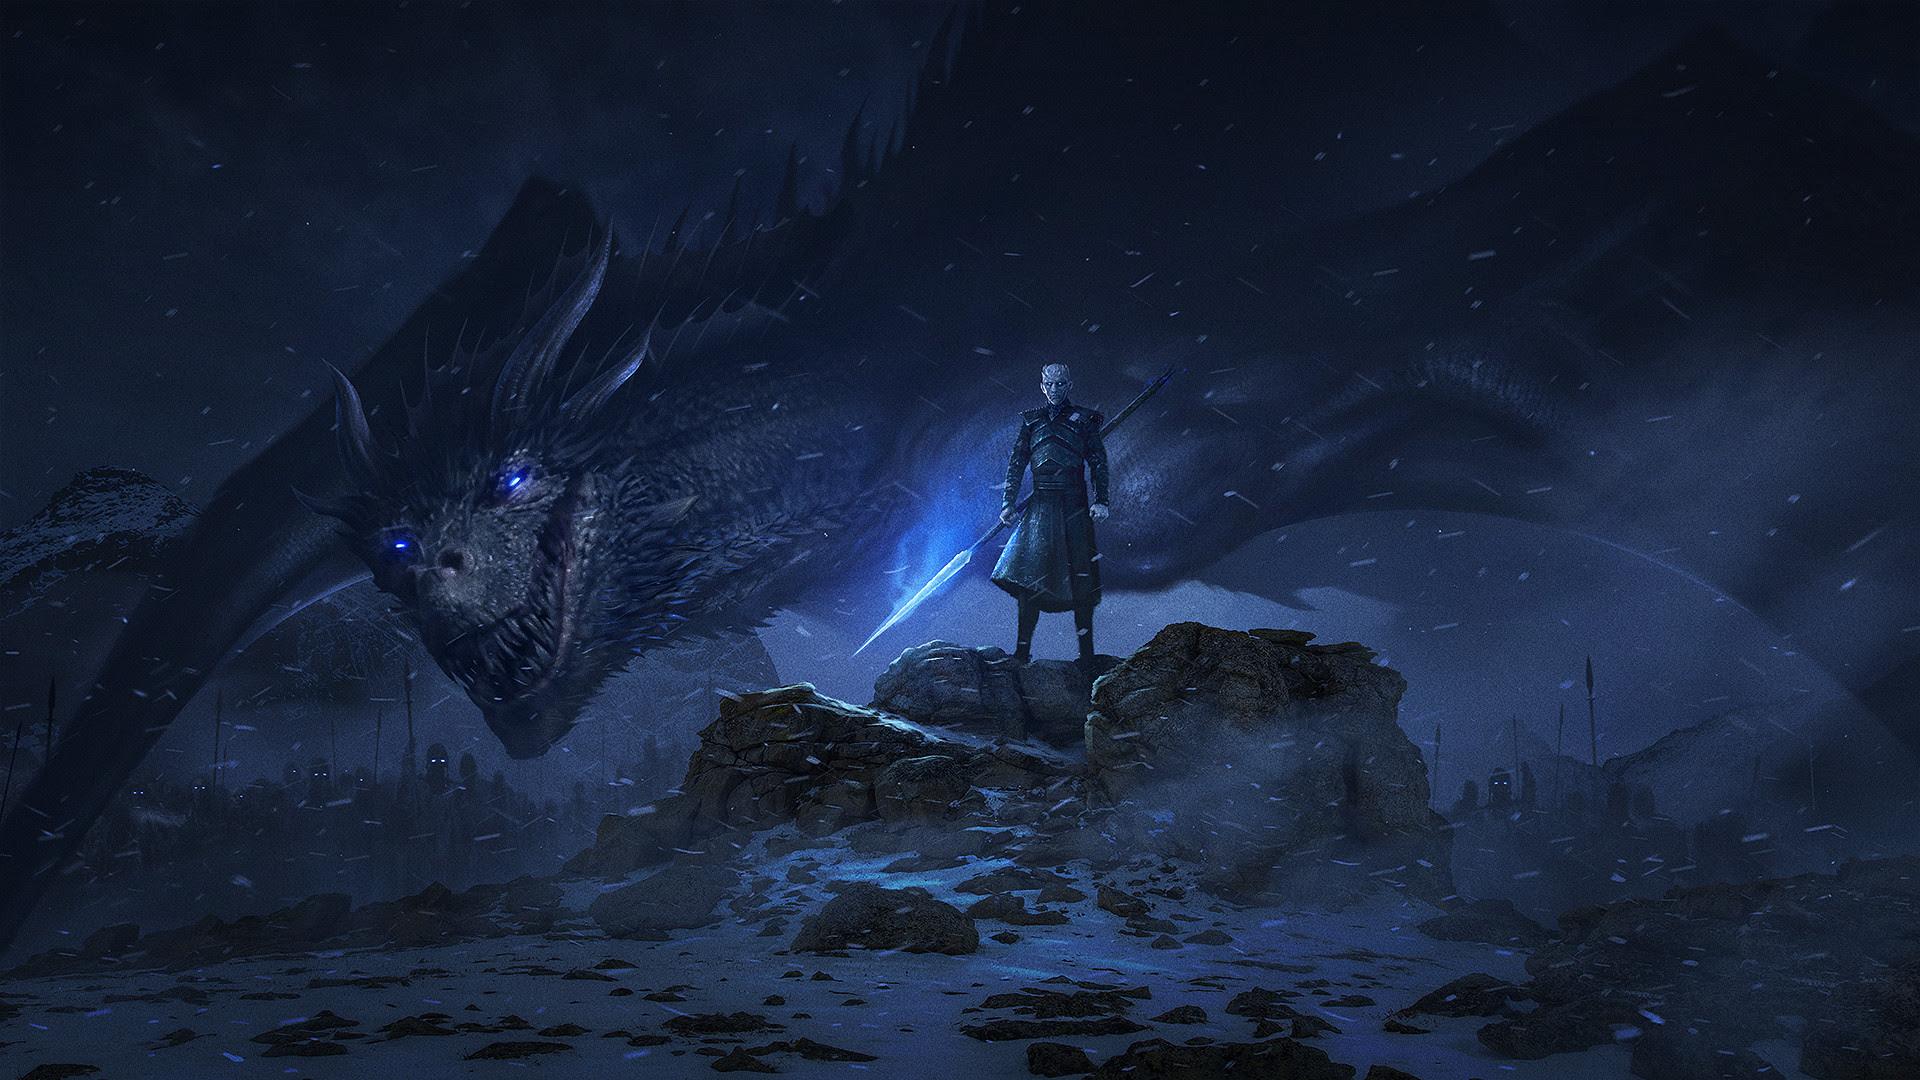 Dragon Night King Game Of Thrones Season 8 Hd Tv Shows 4k